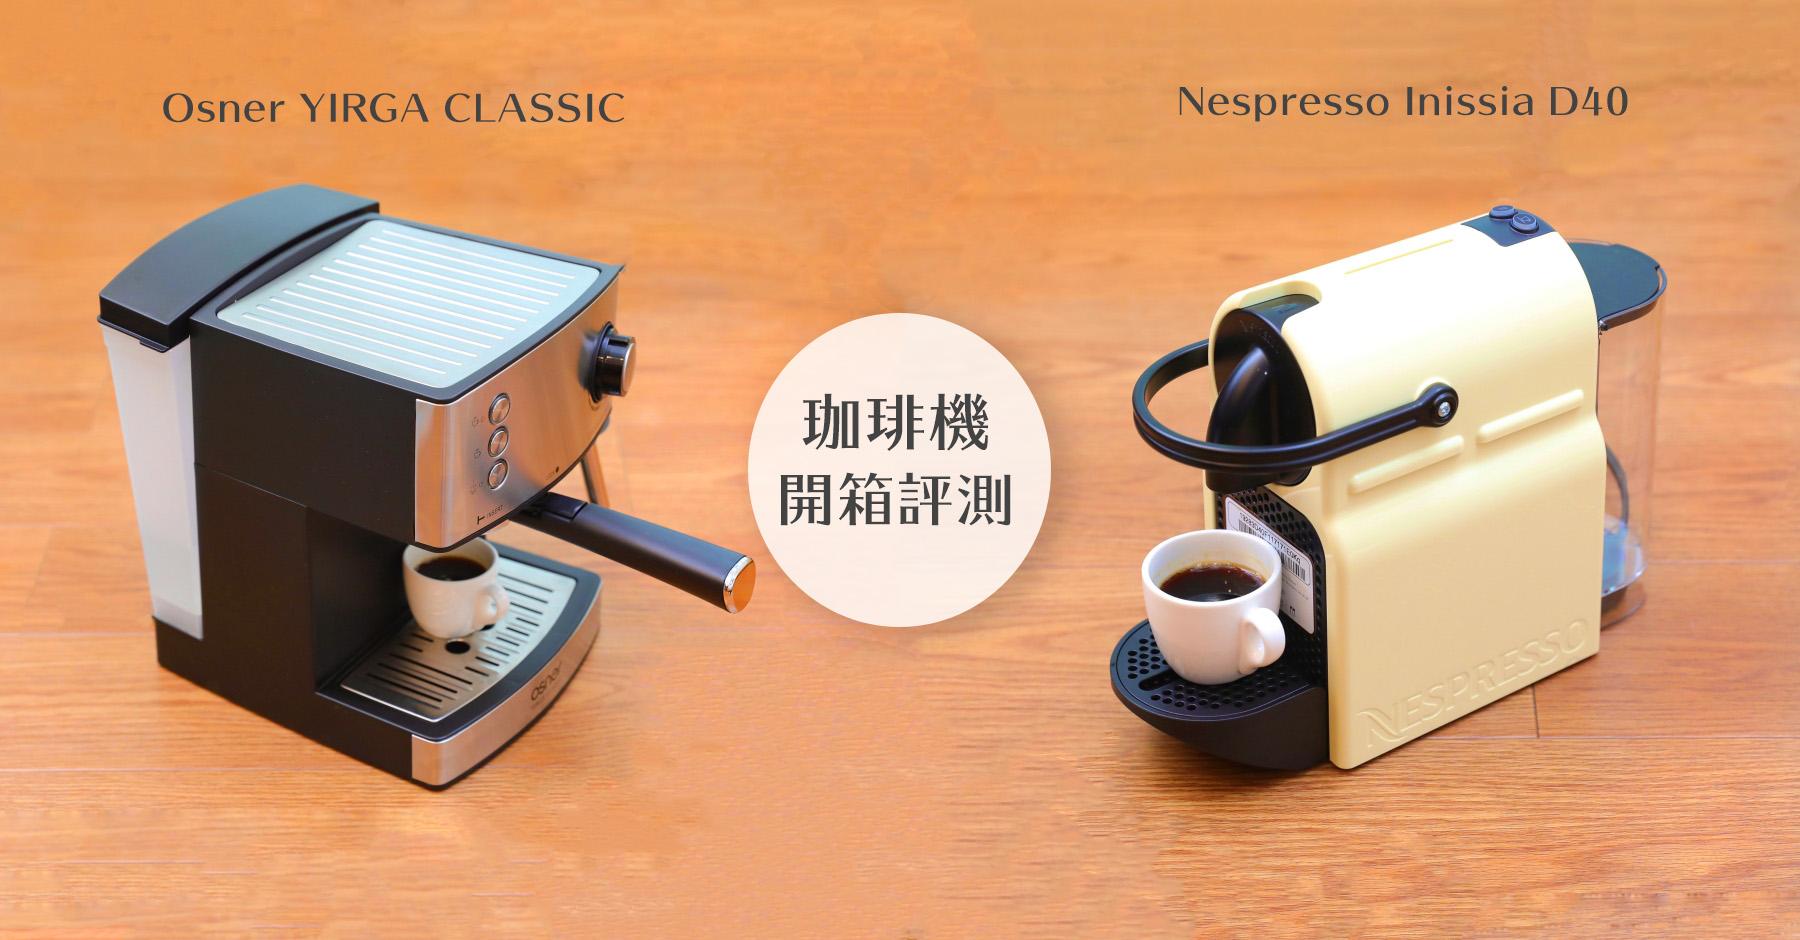 2021膠囊咖啡機推薦比較評價|Osner YIRGA CLASSIC & Nespresso Inissia D40